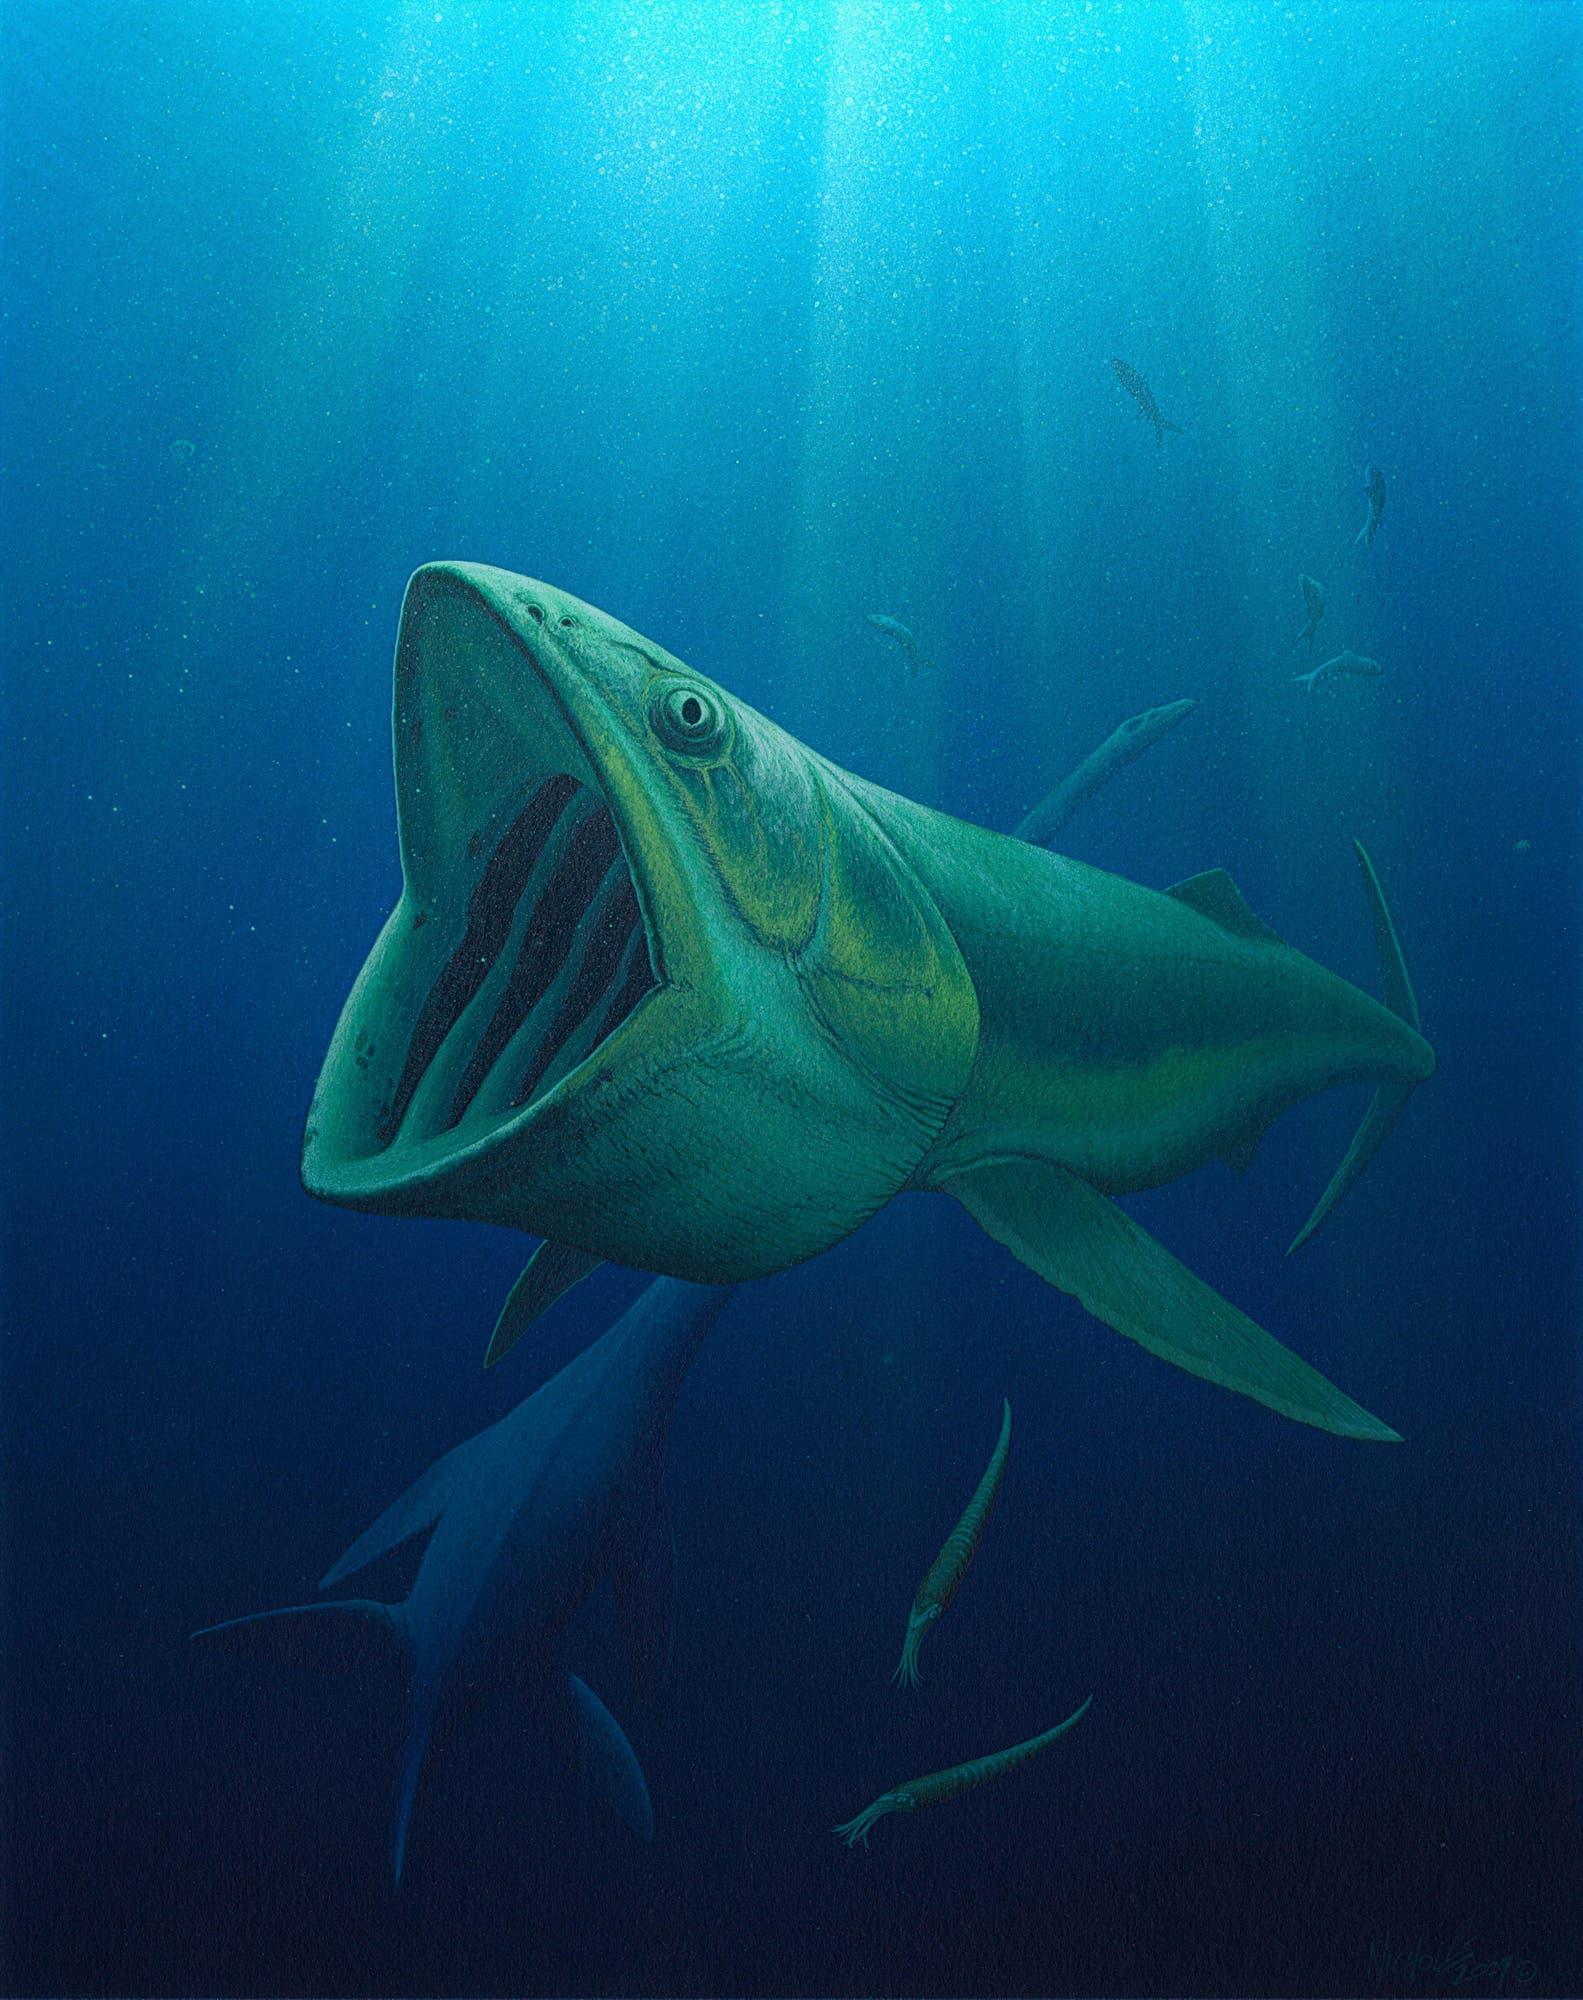 Bonnerichthys